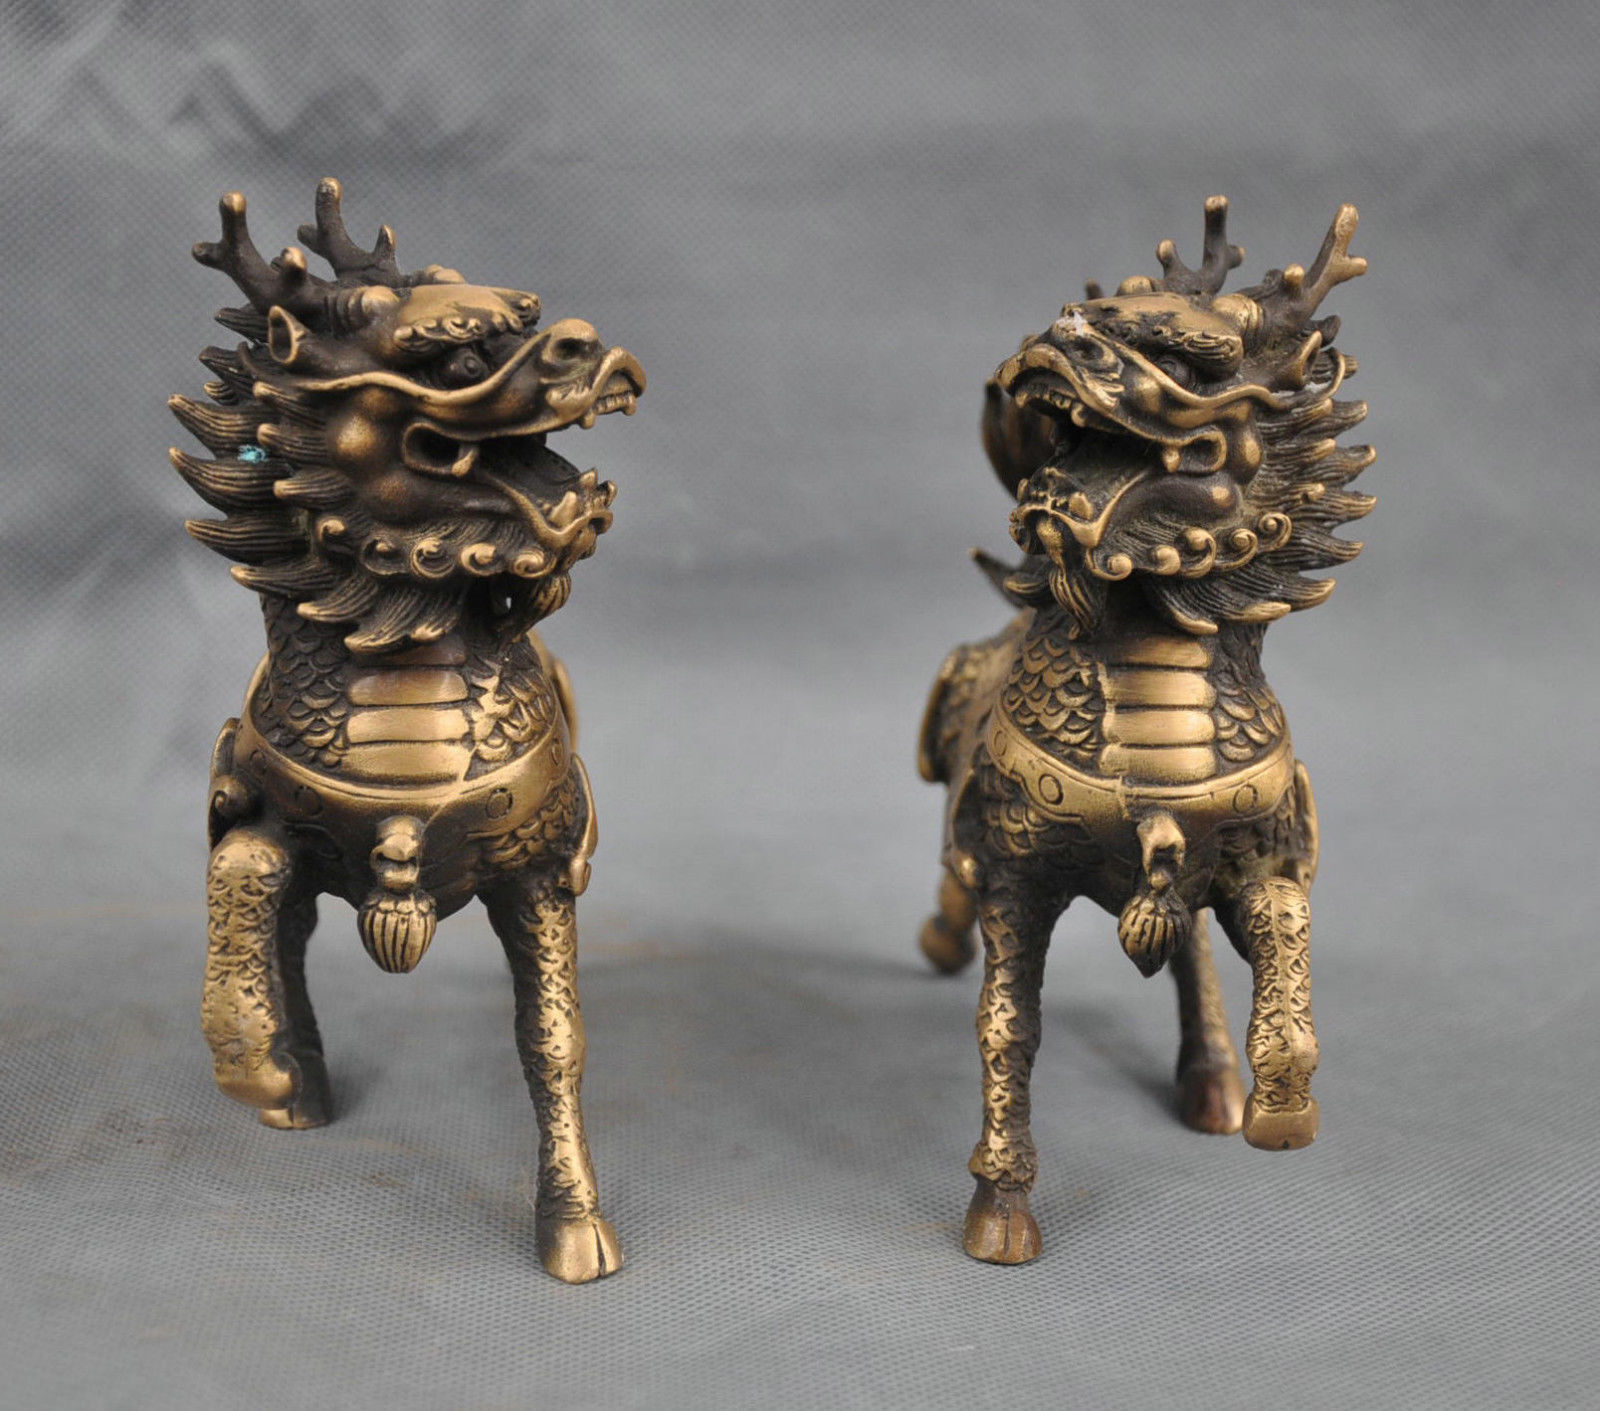 60MM Small Curio Chinese Bronze Animal Unicorn Beast Kylin Chi-lin Qilin Statue